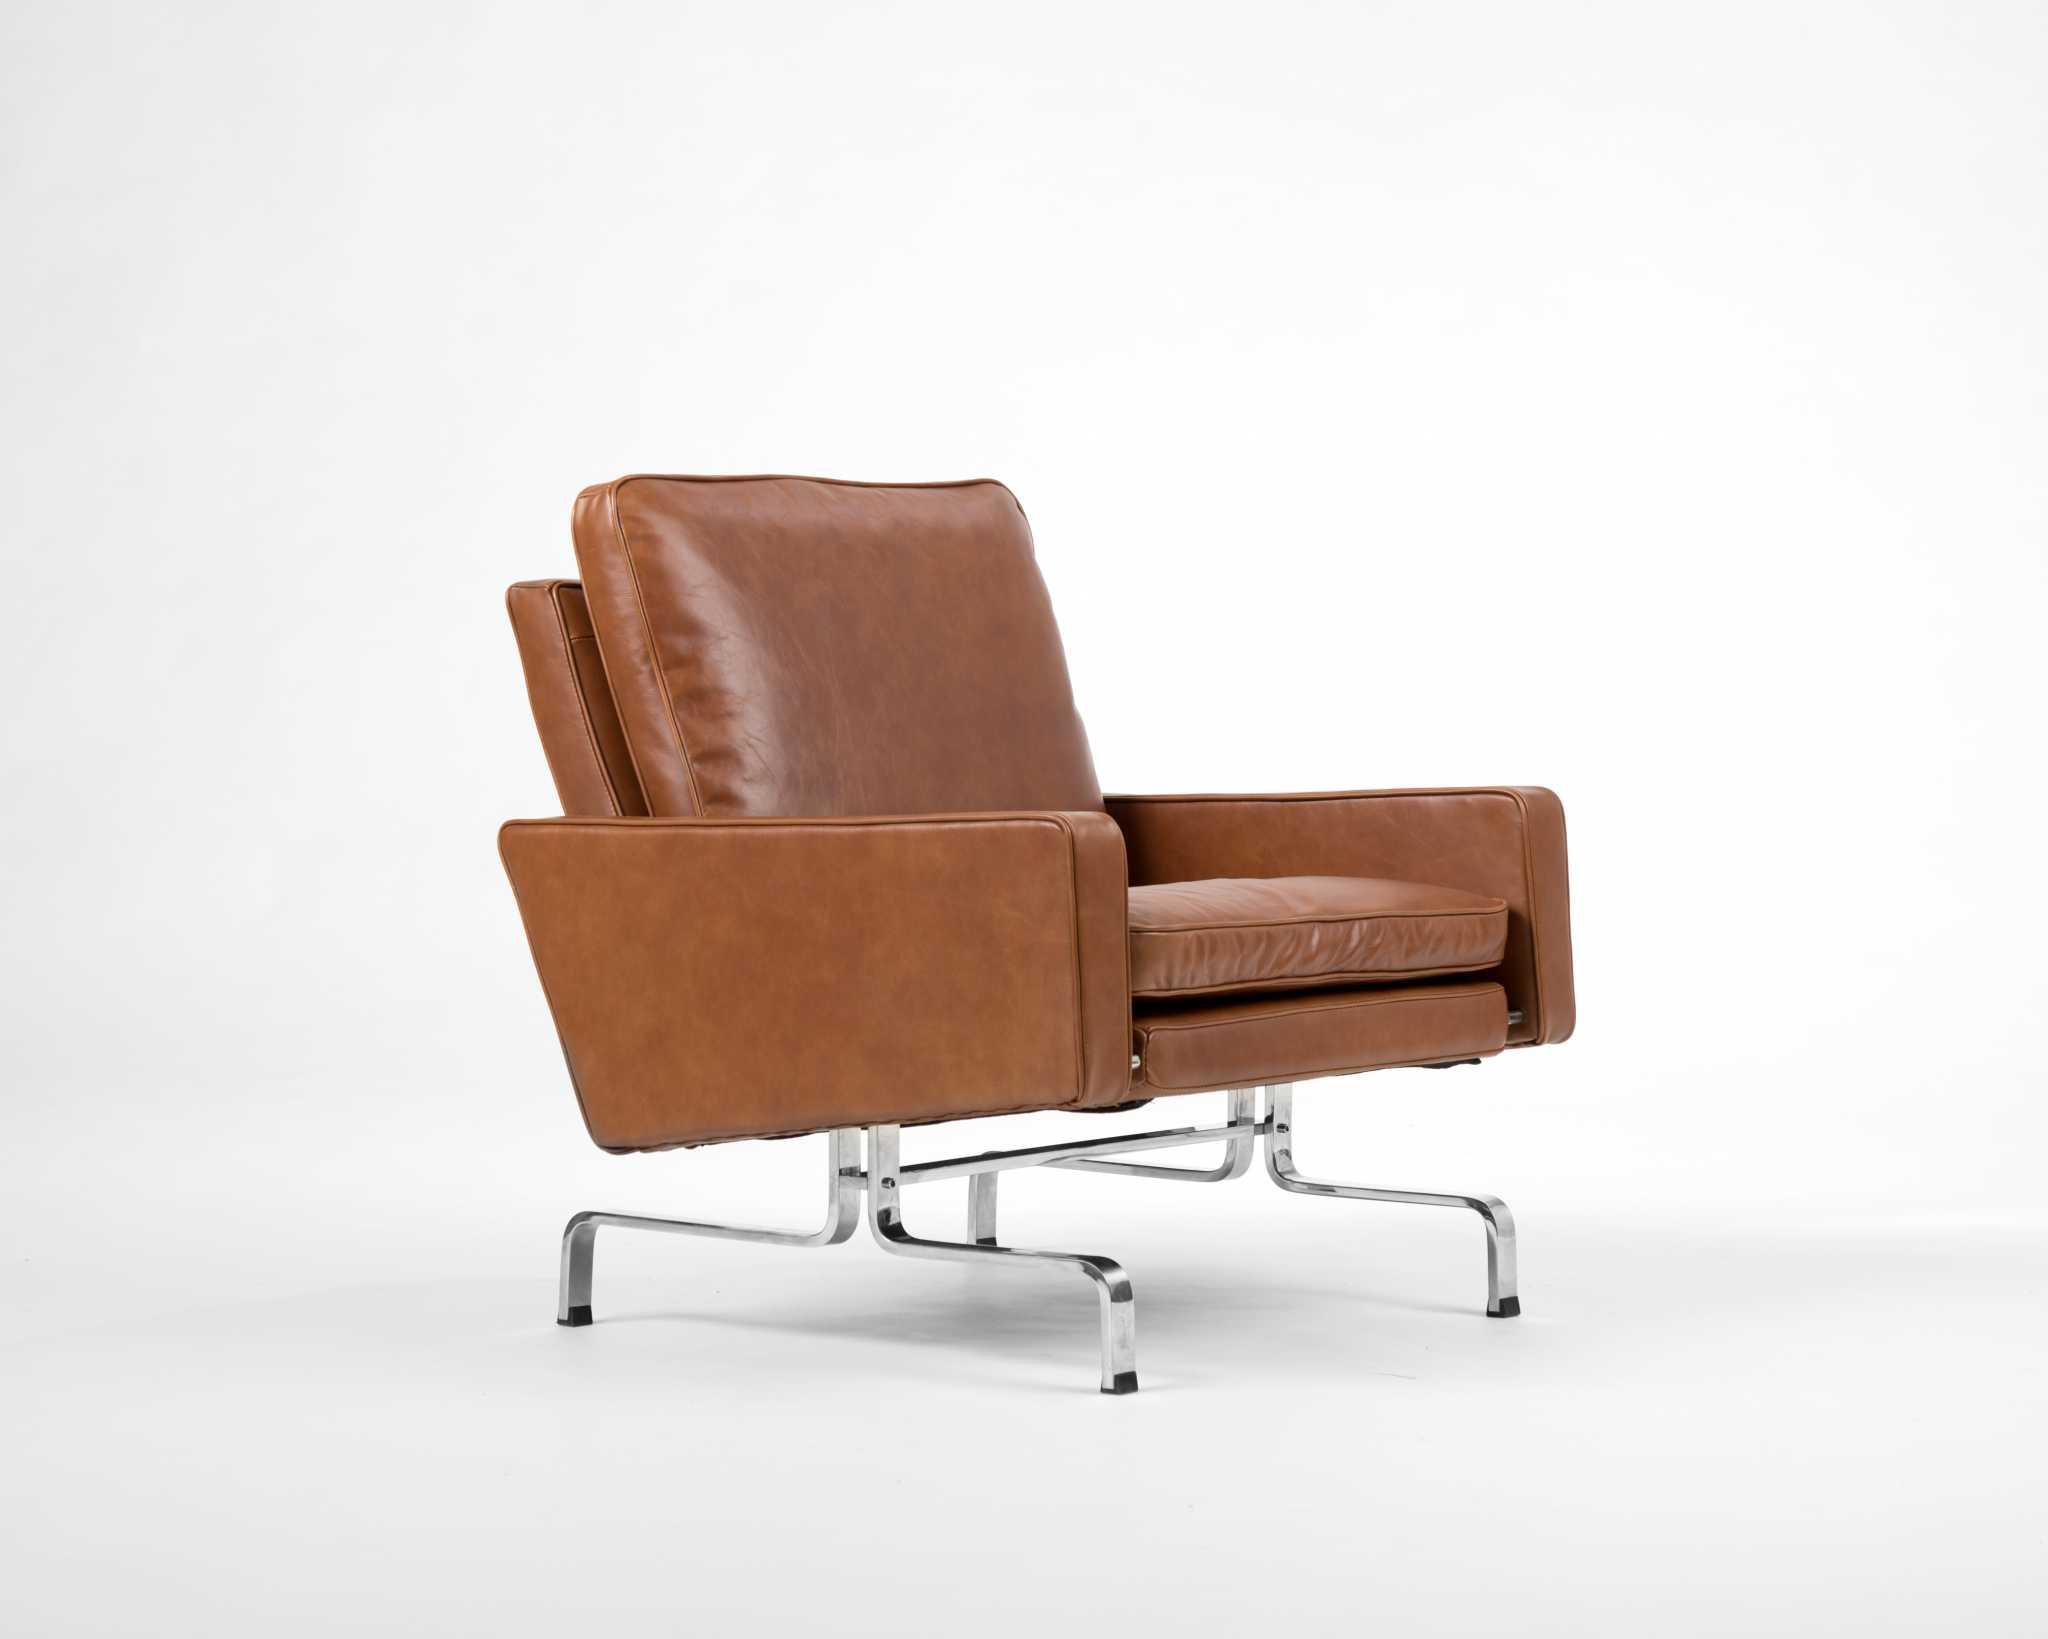 Rove Concepts PK31 Armchair